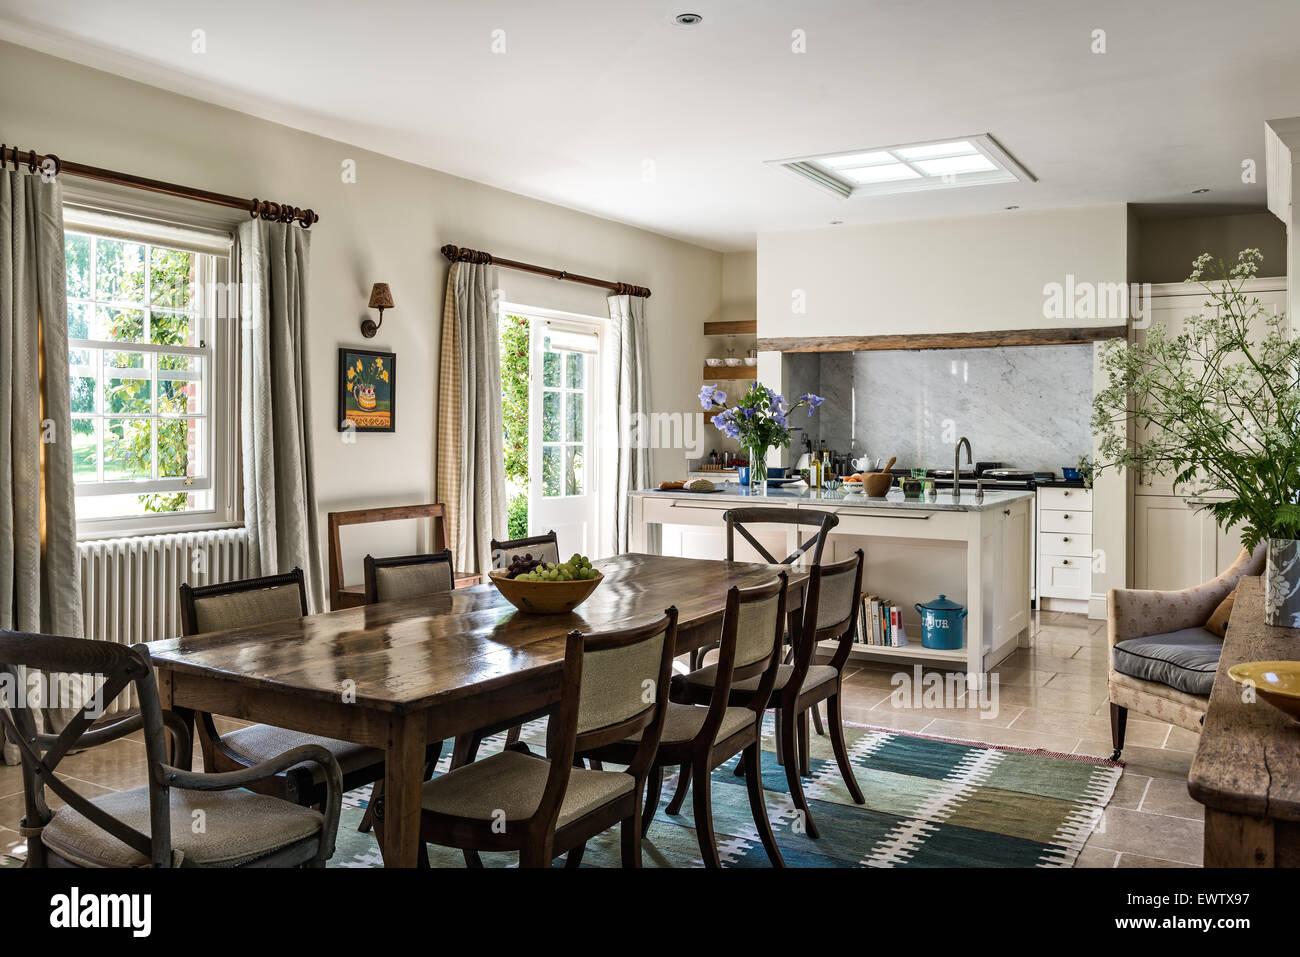 louise island stockfotos louise island bilder alamy. Black Bedroom Furniture Sets. Home Design Ideas